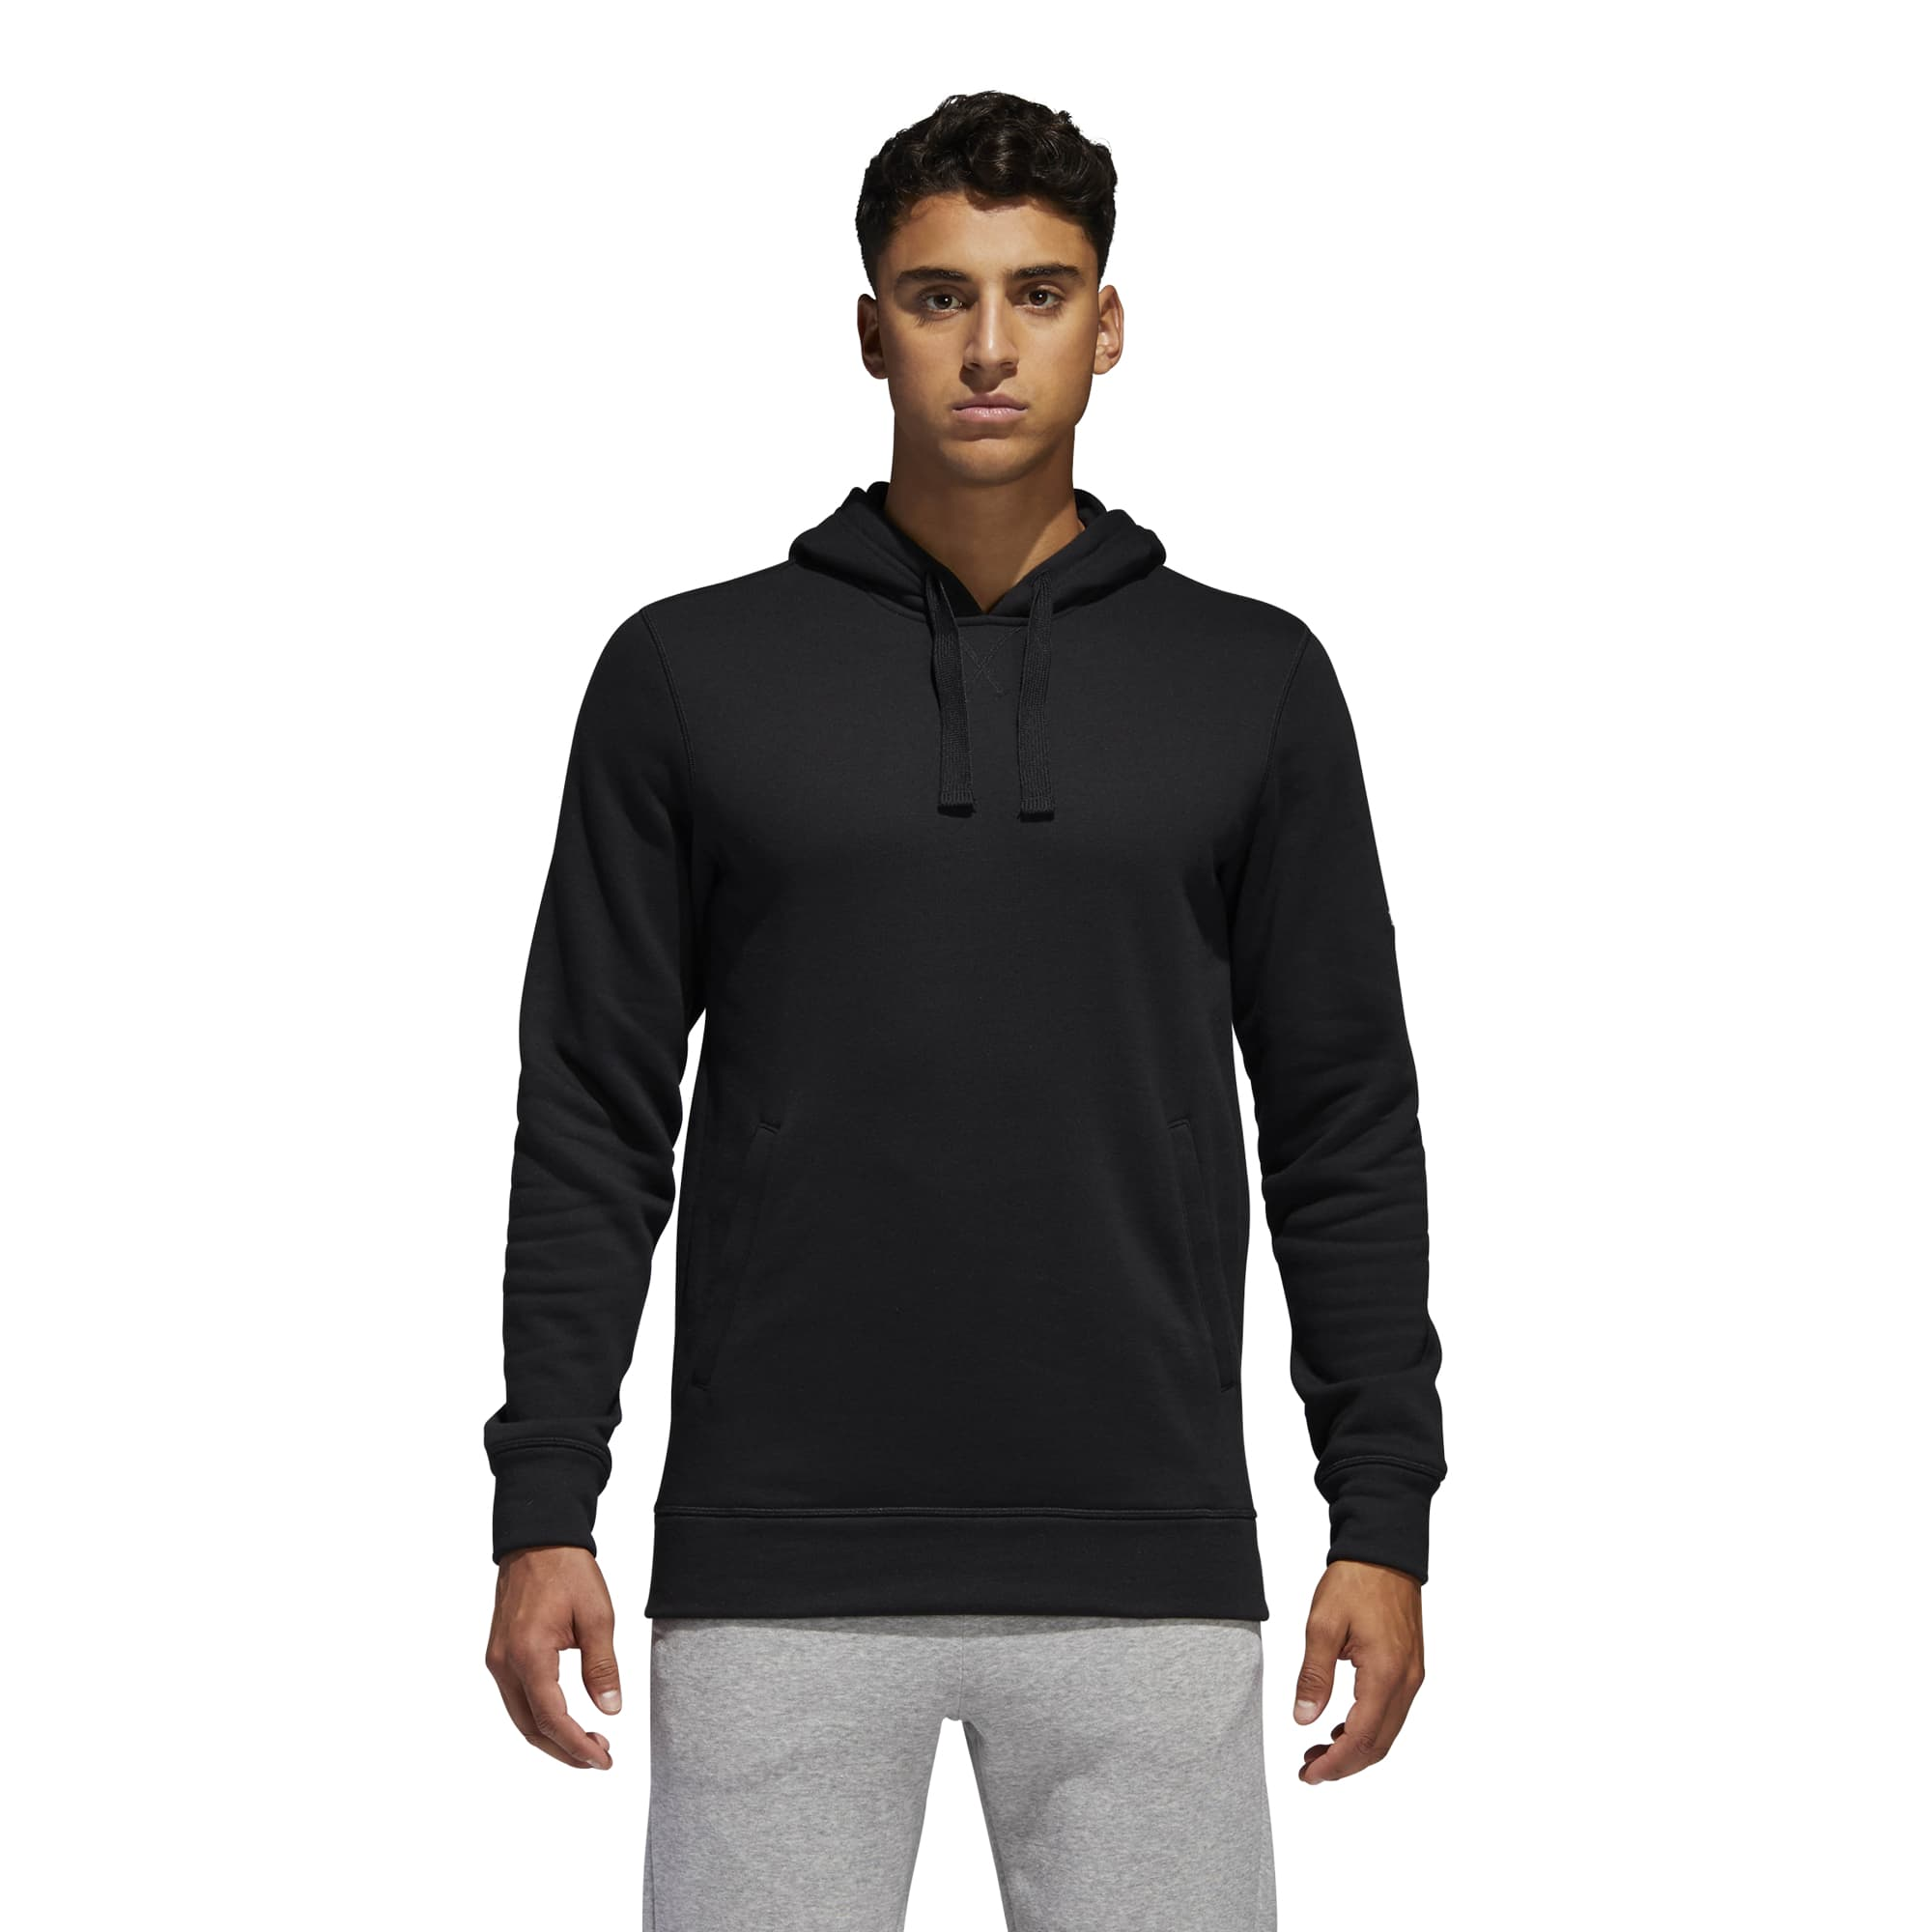 Adidas Hoodie I Tech Fleece Soccerx nX8OP0kw